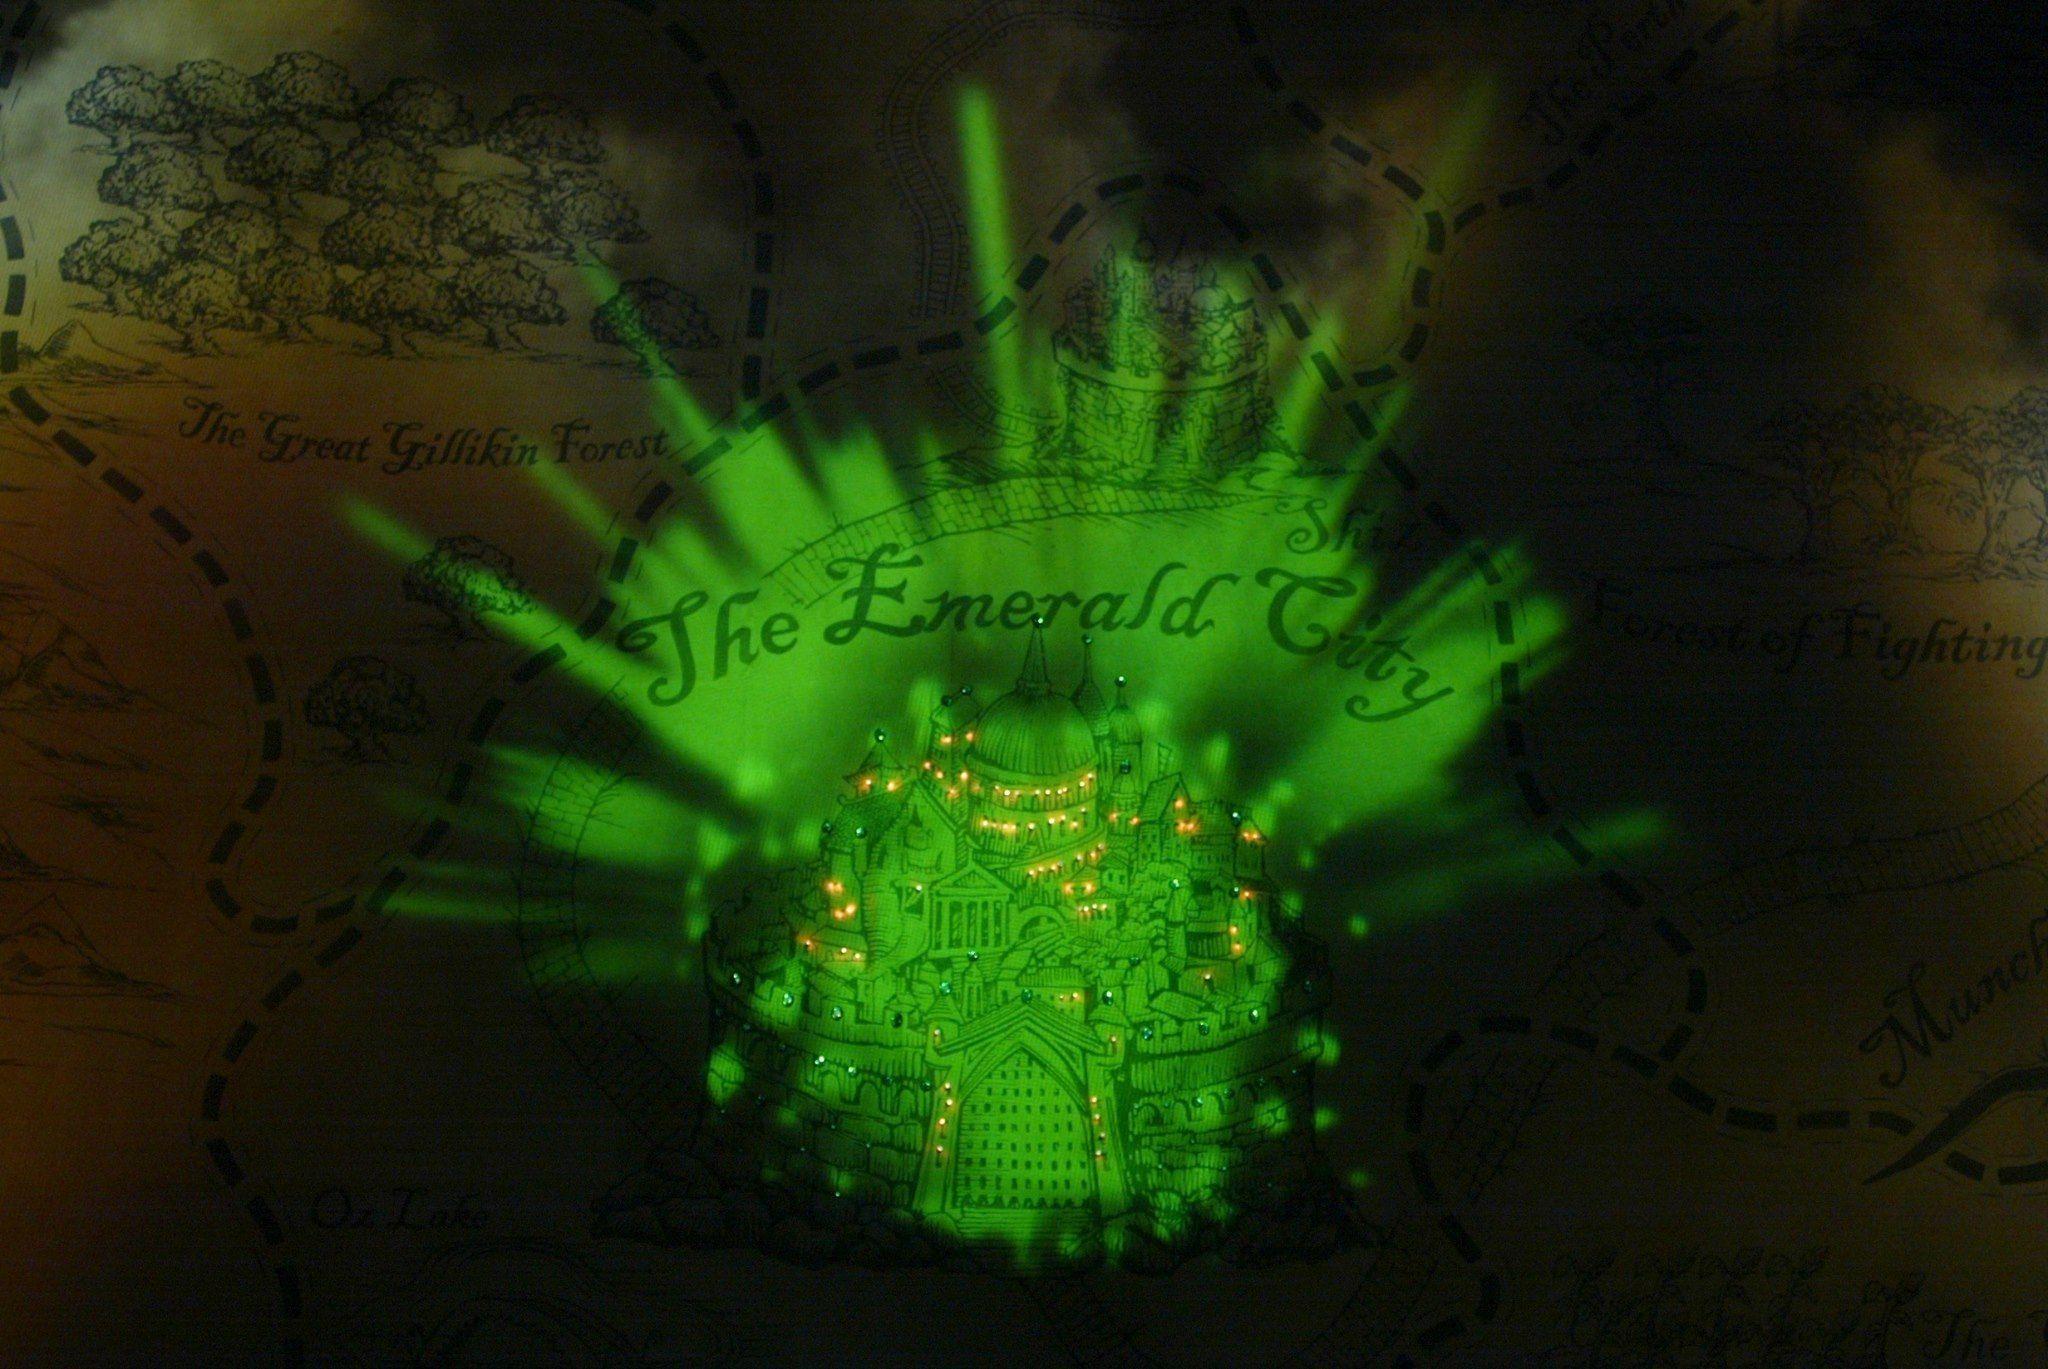 emerald city for pinterest - photo #12